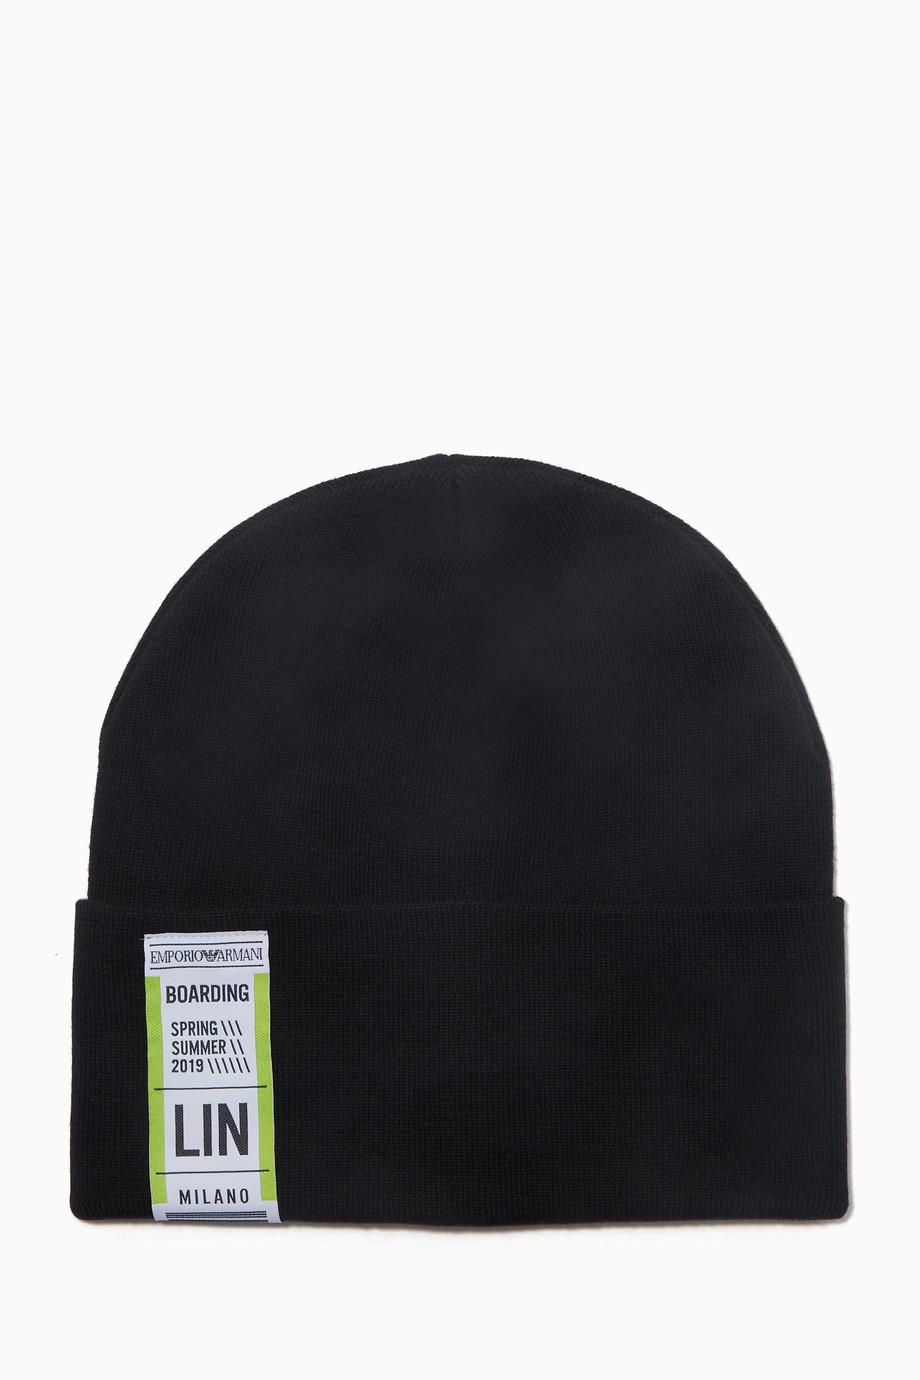 3611c27c0b4 Shop Emporio Armani Black Black Baggage Tag Beanie Hat for Men ...